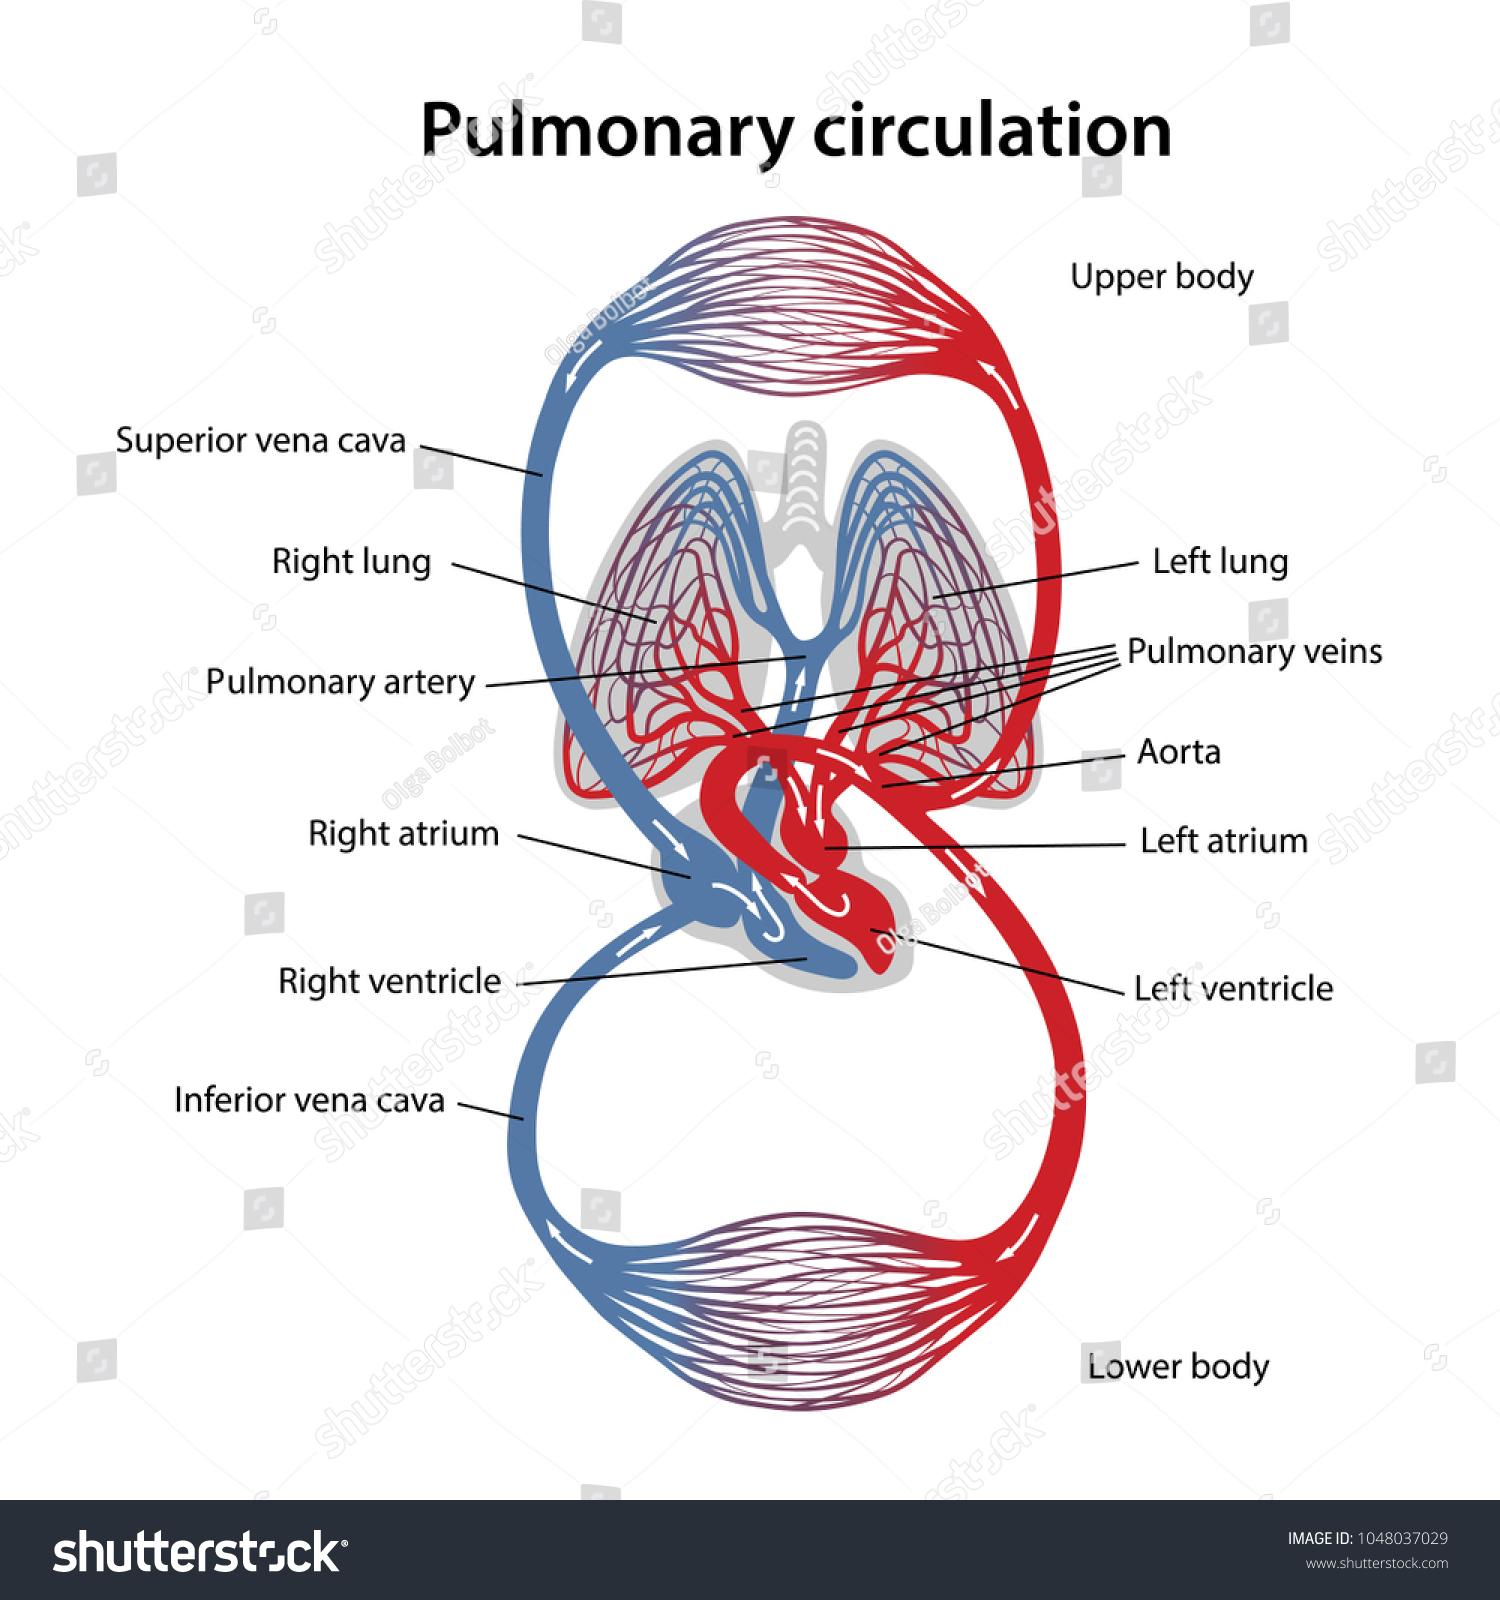 Circulation Blood Diagram Pulmonary Circulation Vector Stock Vector